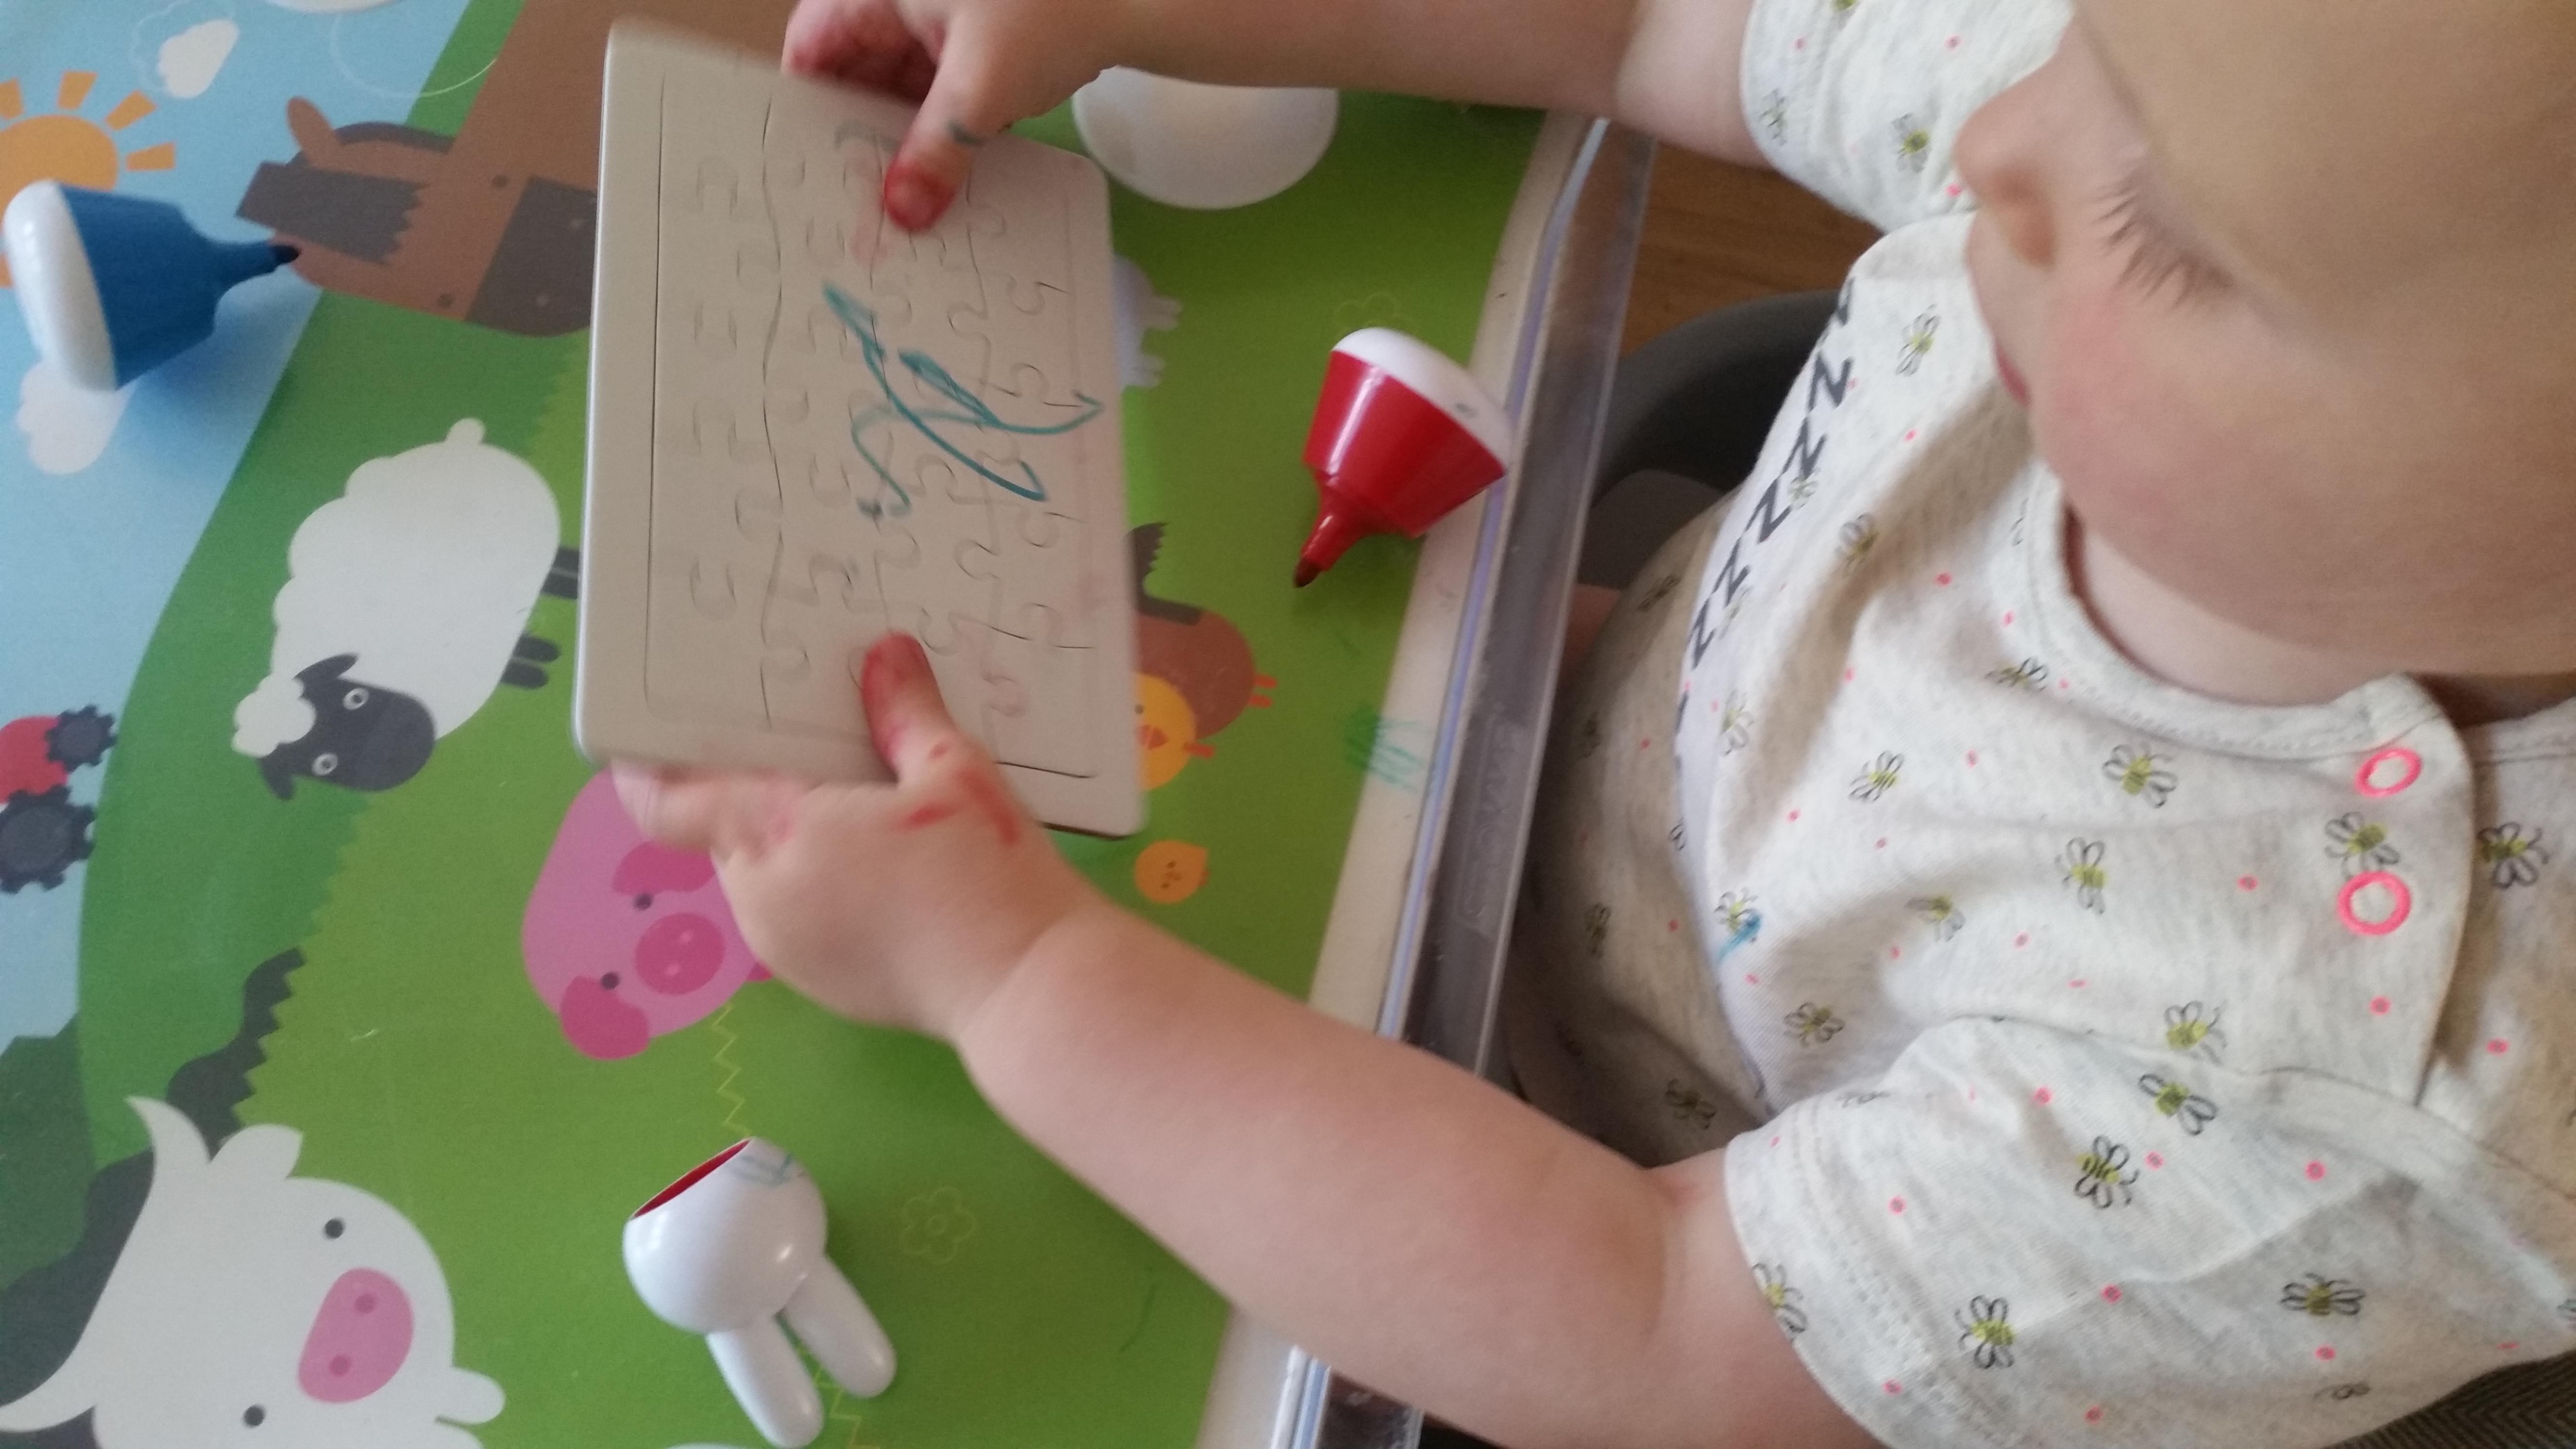 5-16-vaderdag-knutselwerkje-vanaf-1-jaar-peuter-kleuter-dreumes-baby-leuk=puzzel-origineel-mama-moeder-papa-vader-nanny-amsterdam-kleuren